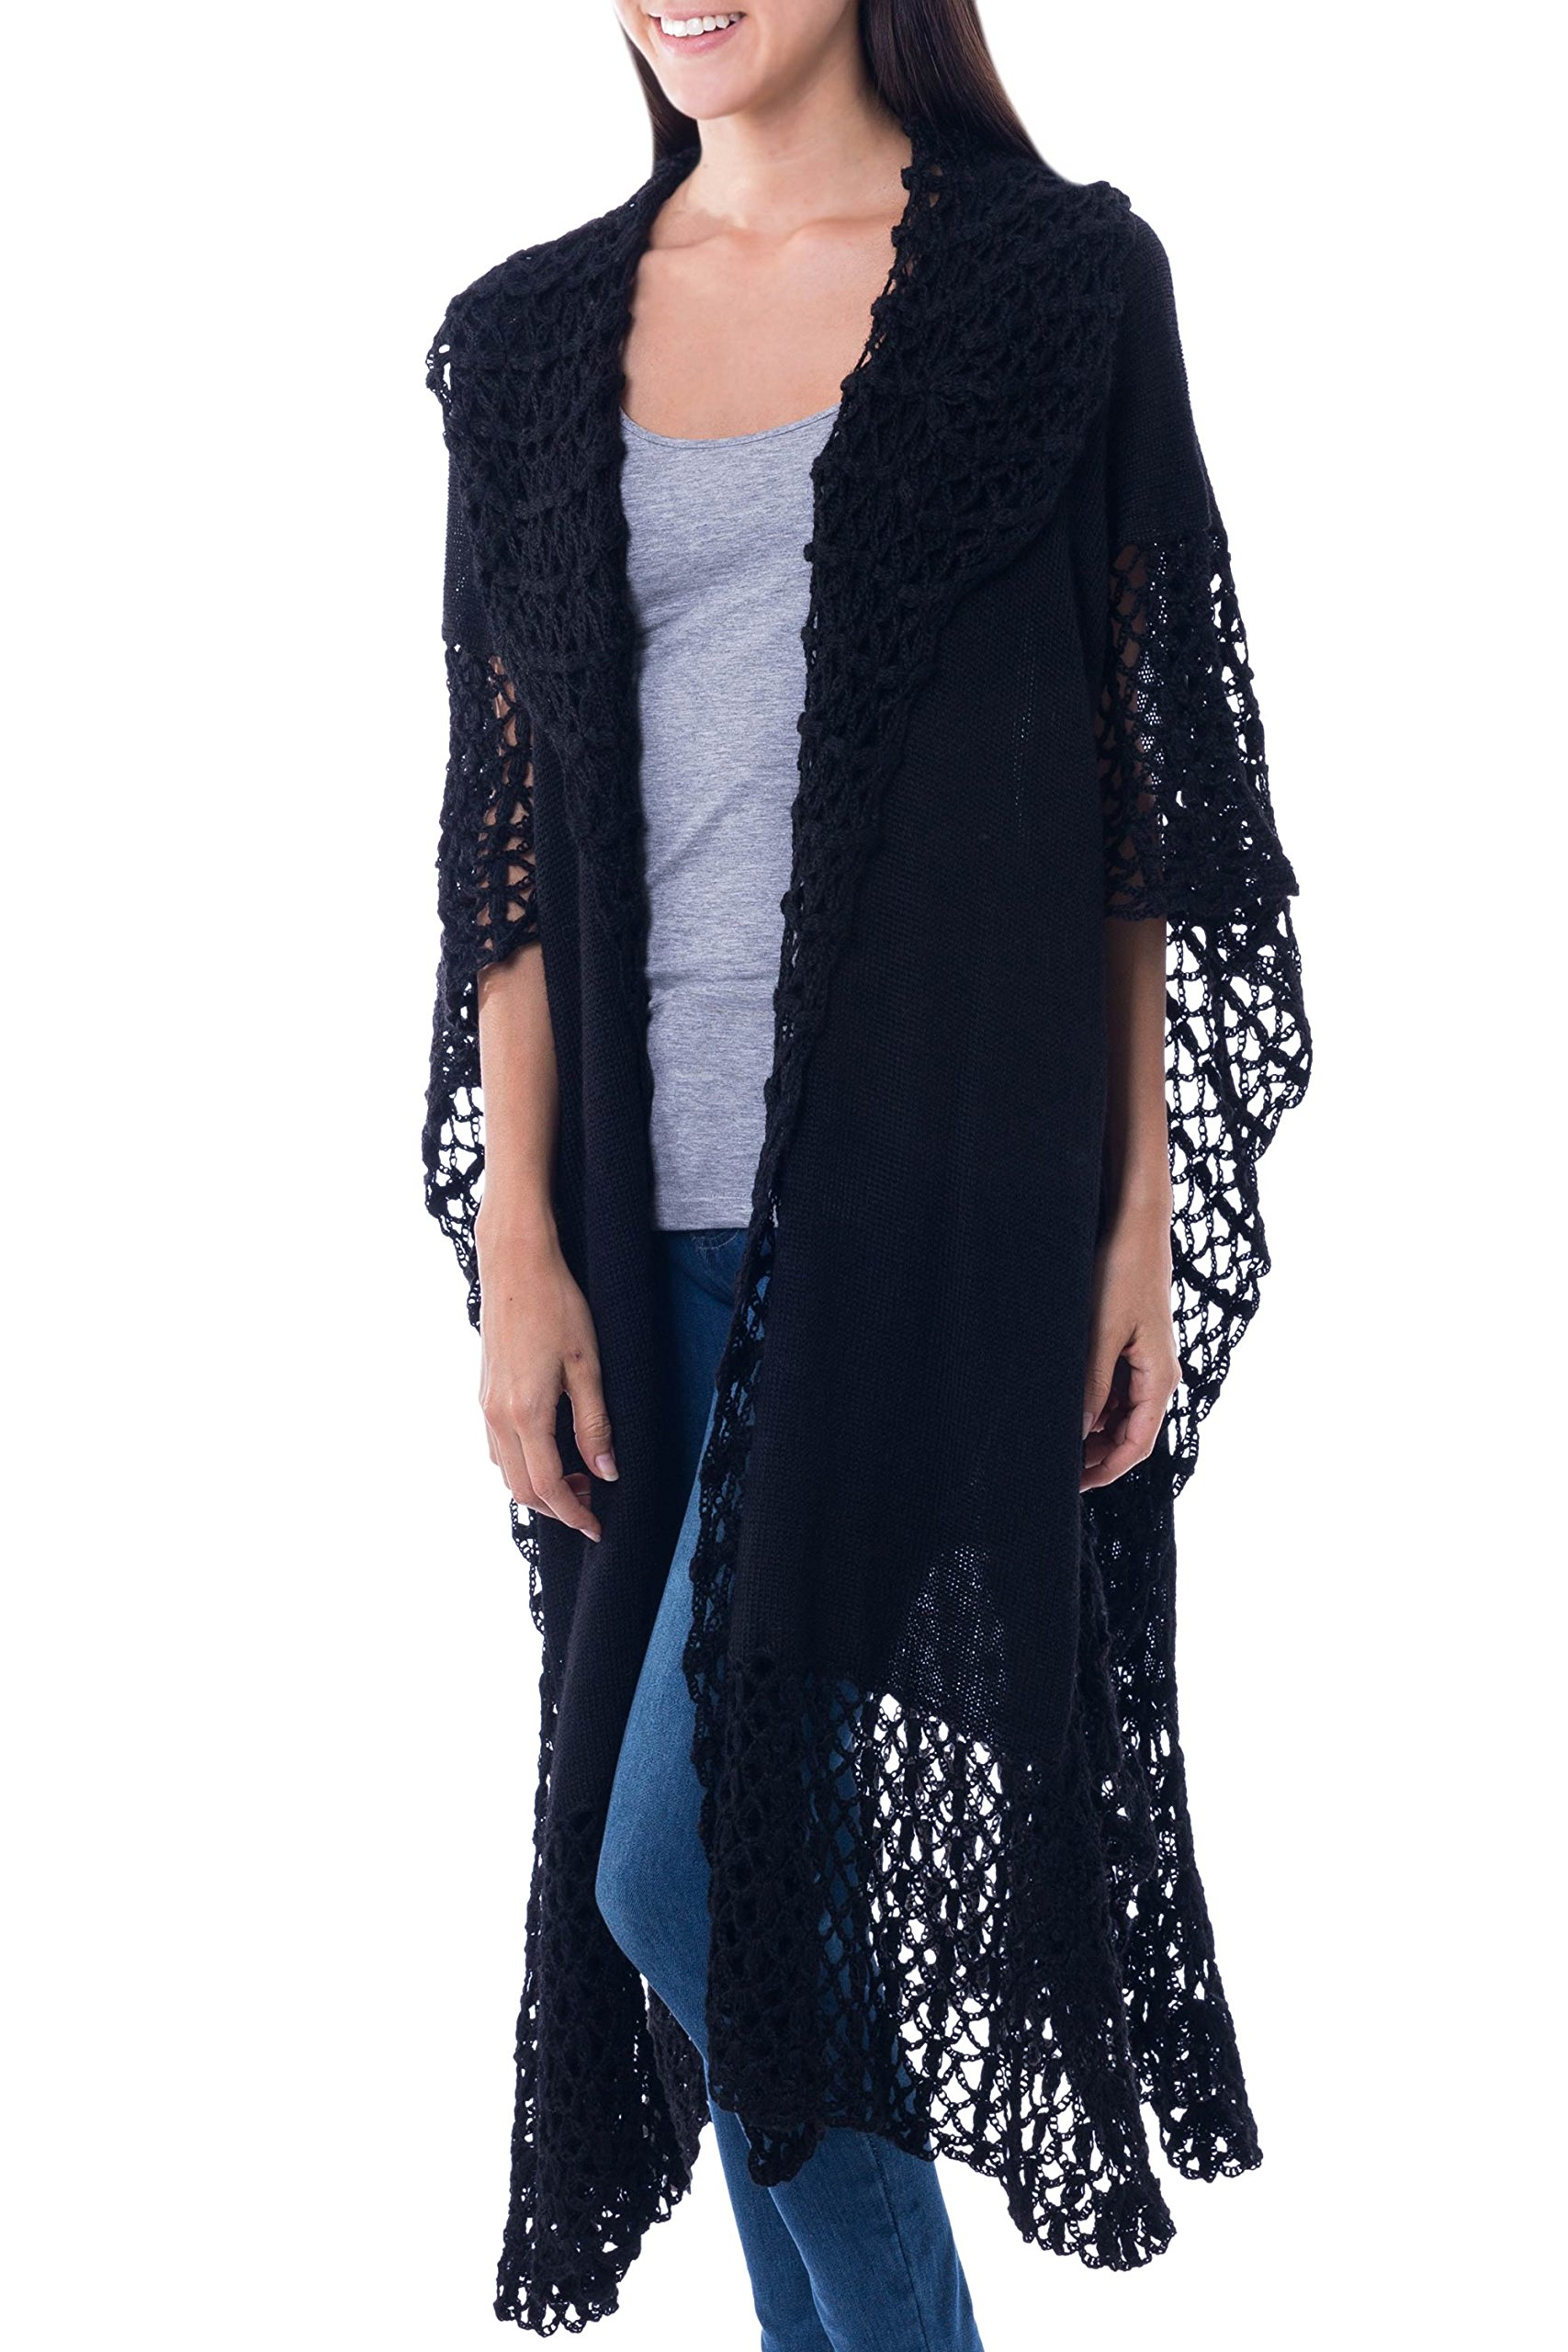 NOVICA Black 100% Alpaca Ruana Cloak, 'Ebony Whisper'